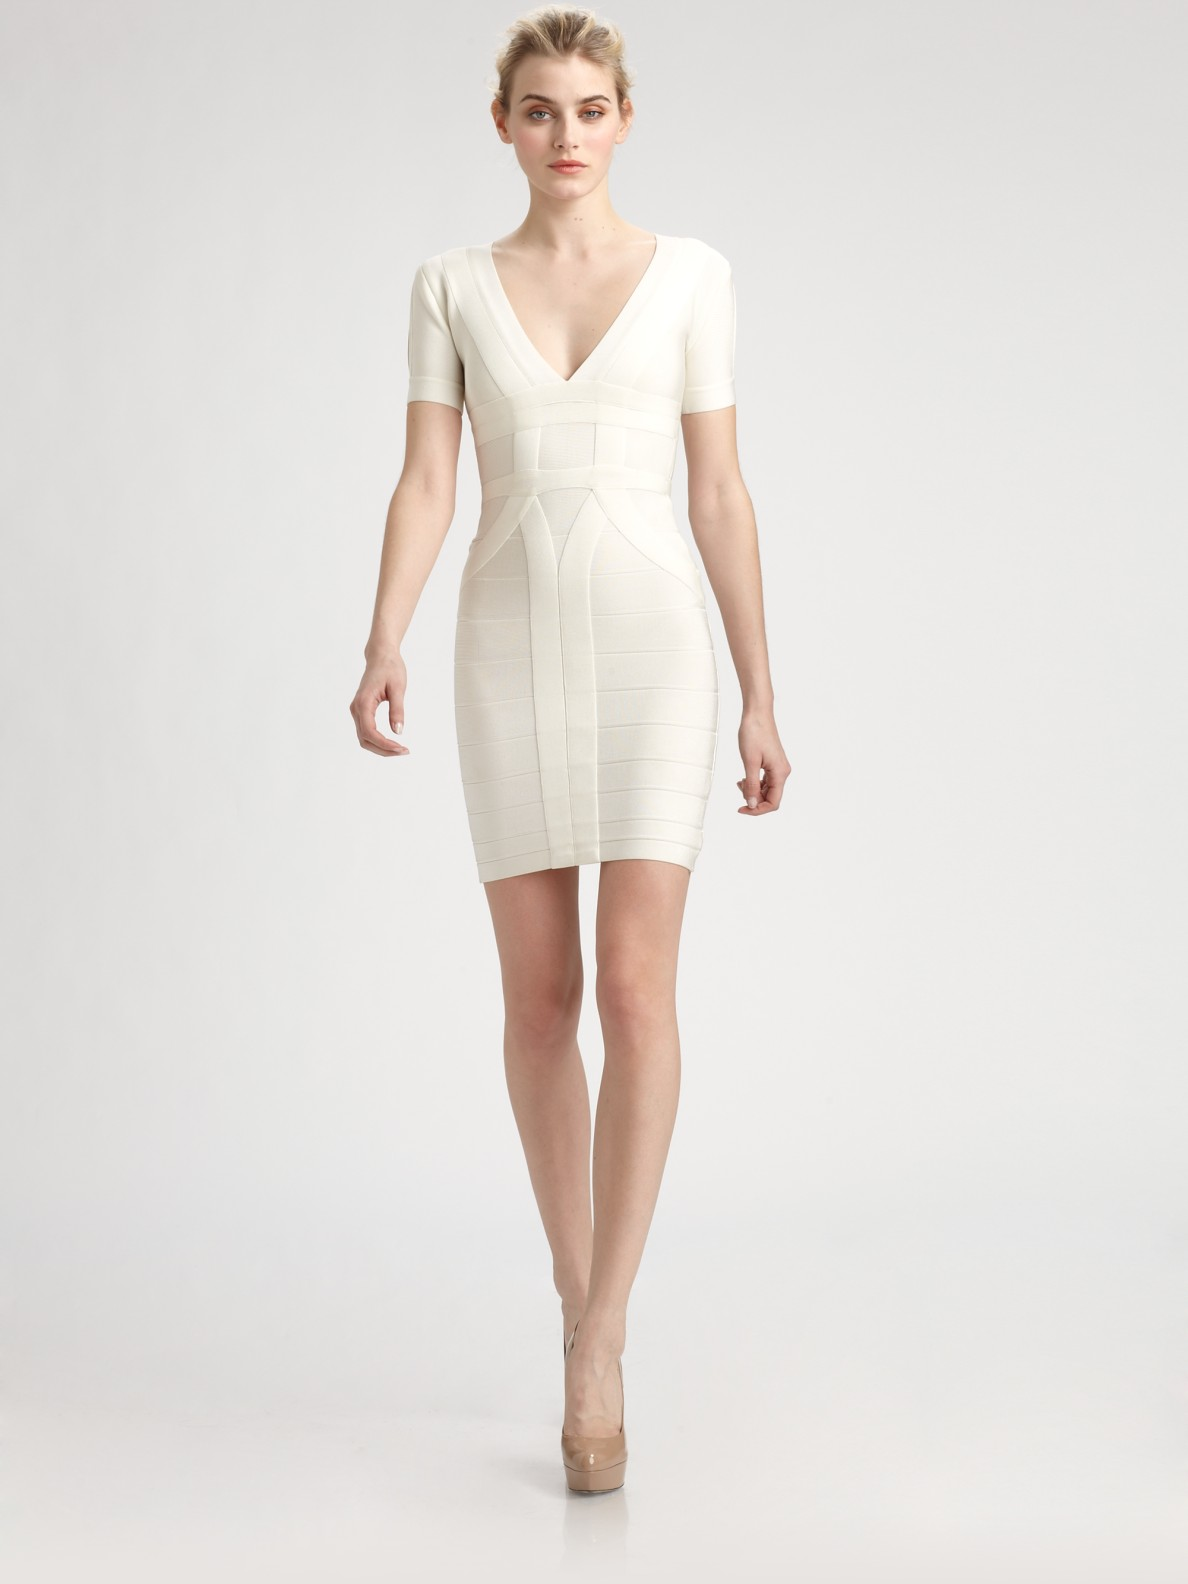 Lyst Herv 233 L 233 Ger Wynn Dress In White